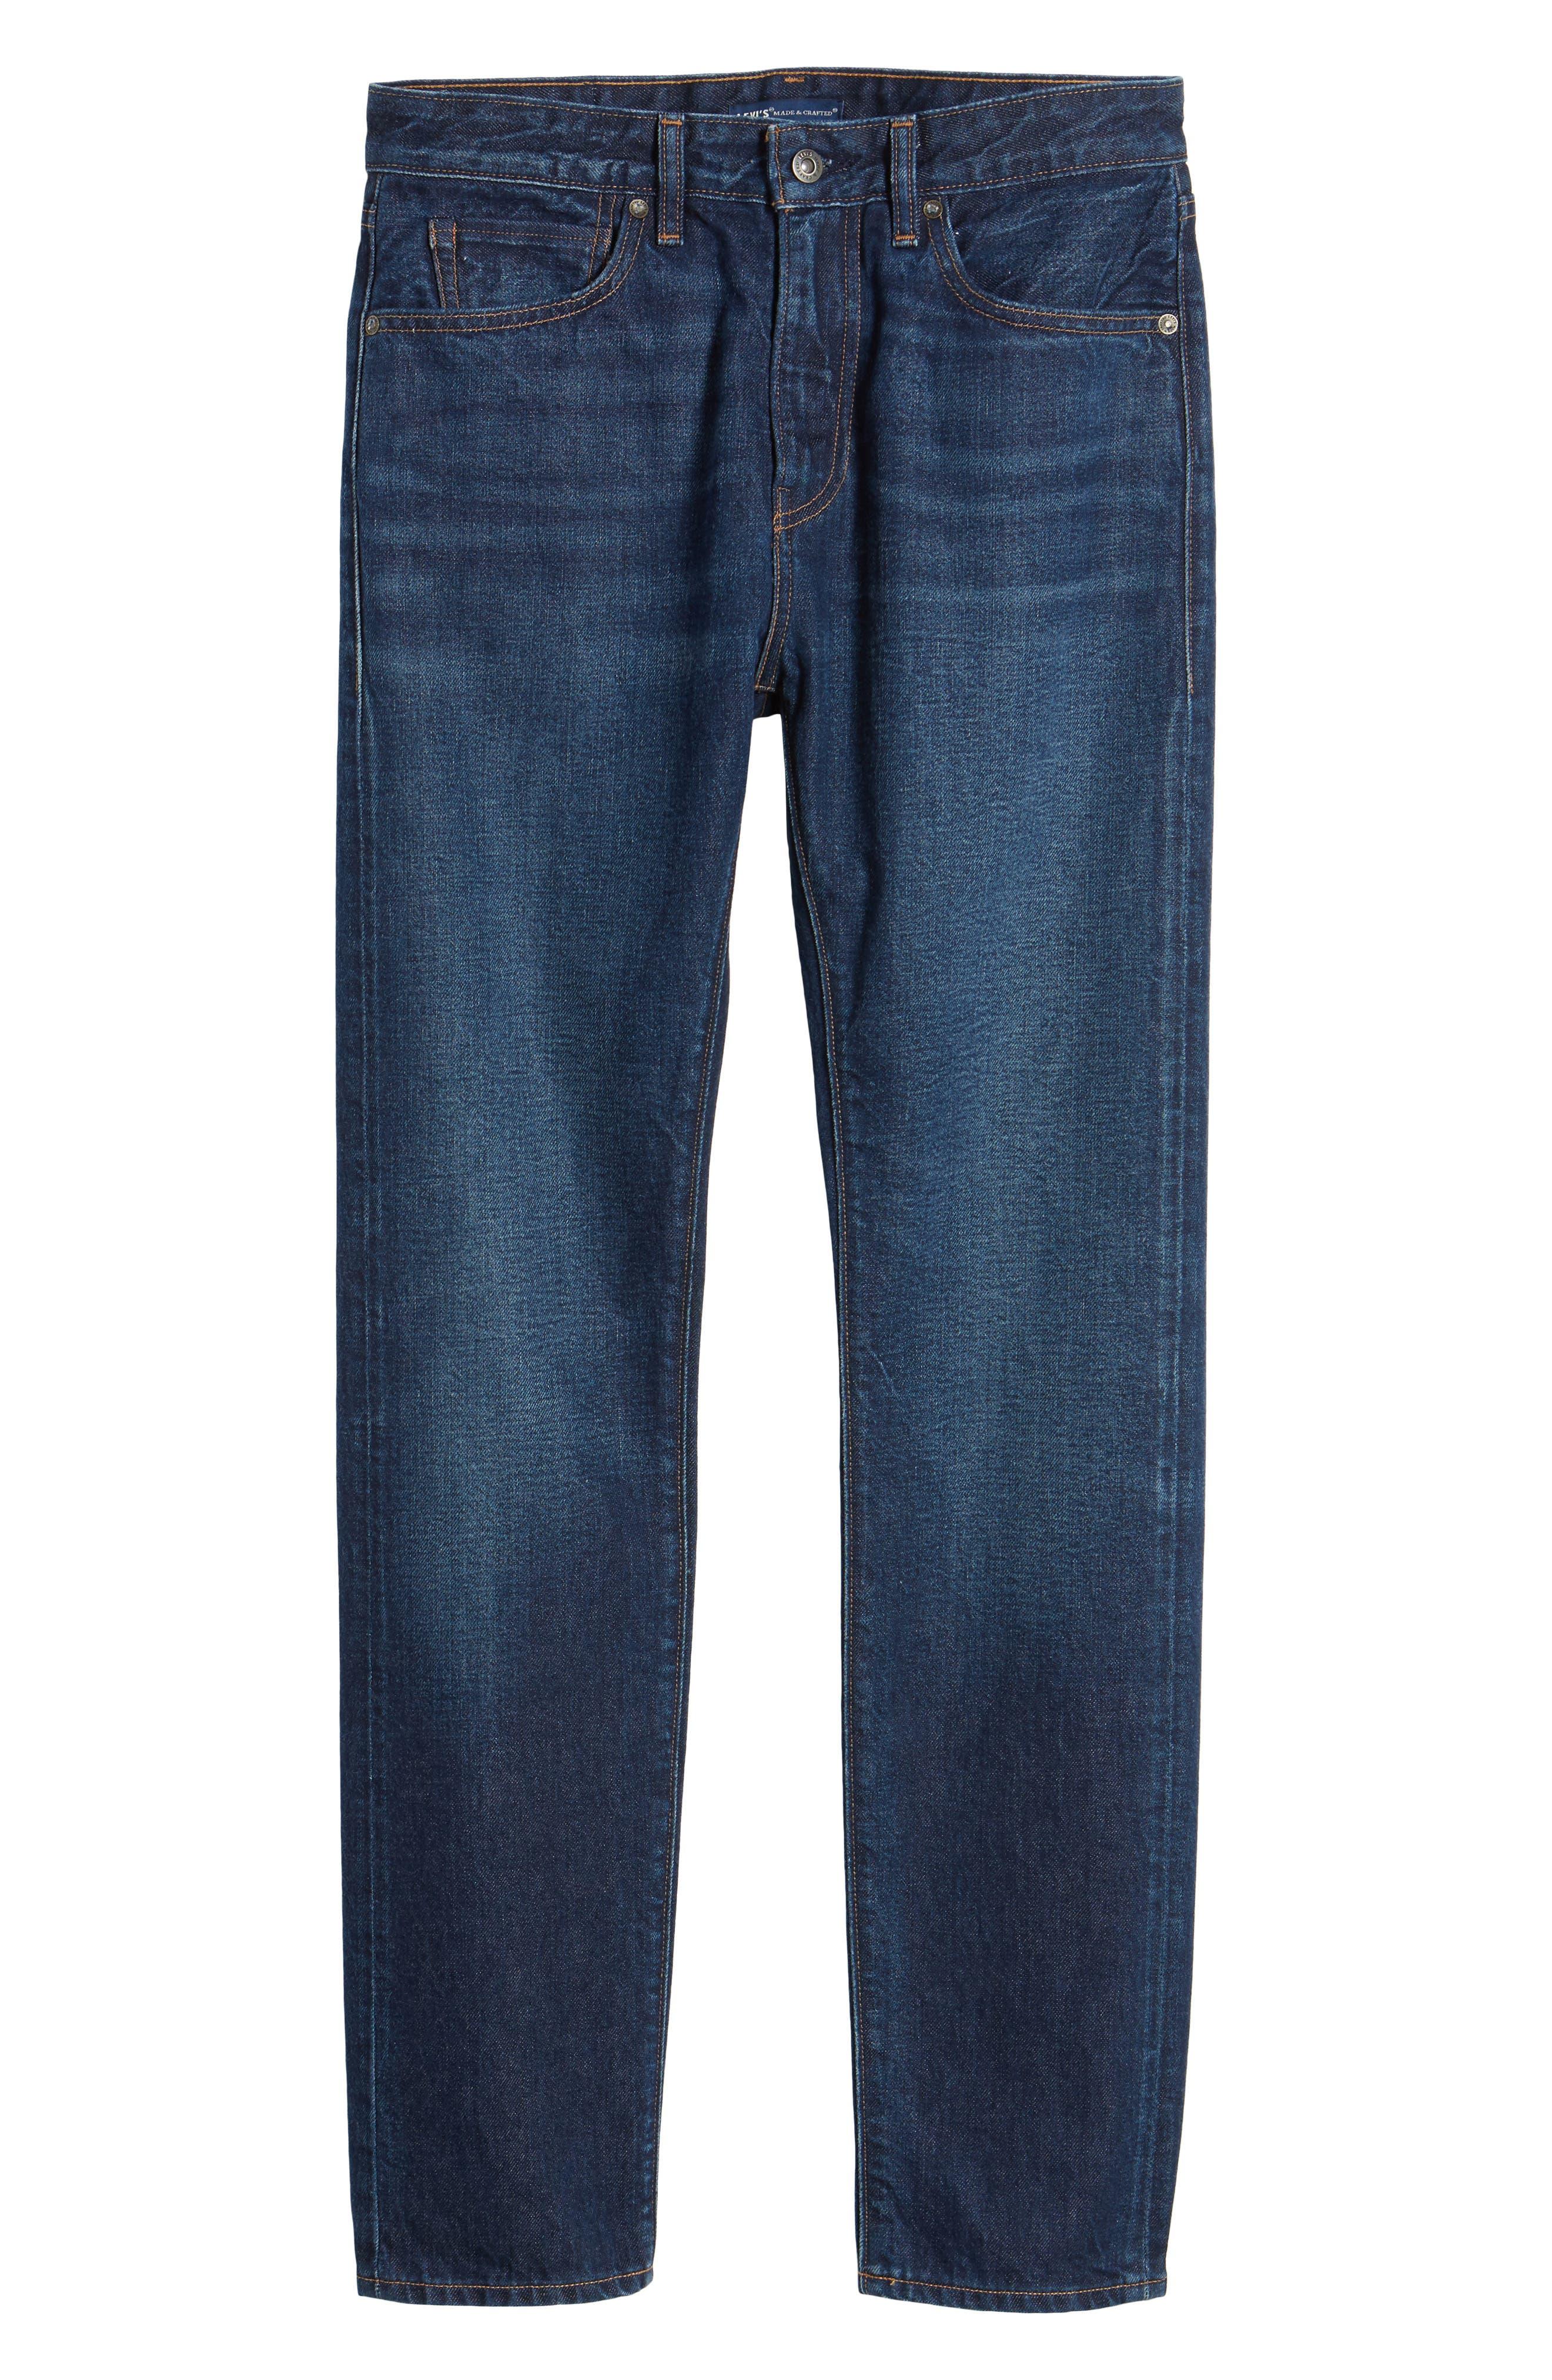 Tack Slim Fit Jeans,                             Alternate thumbnail 6, color,                             401